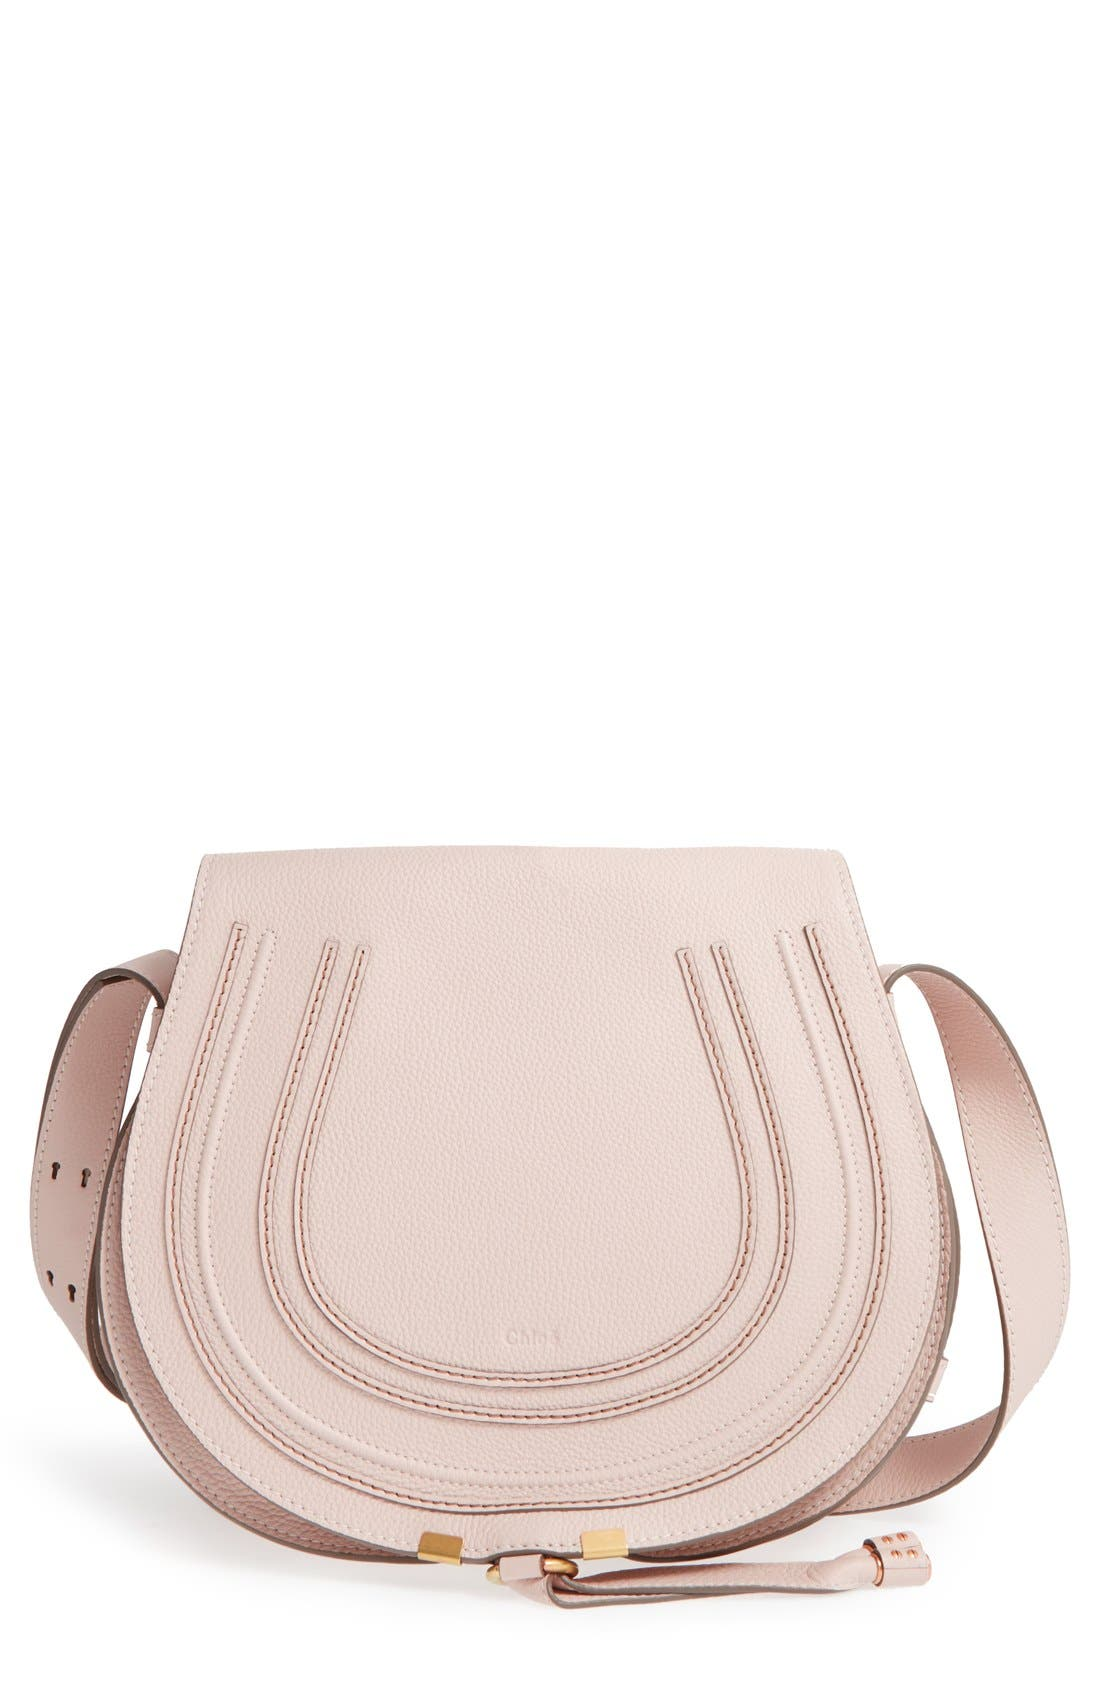 Alternate Image 1 Selected - Chloé 'Marcie - Medium' Leather Crossbody Bag